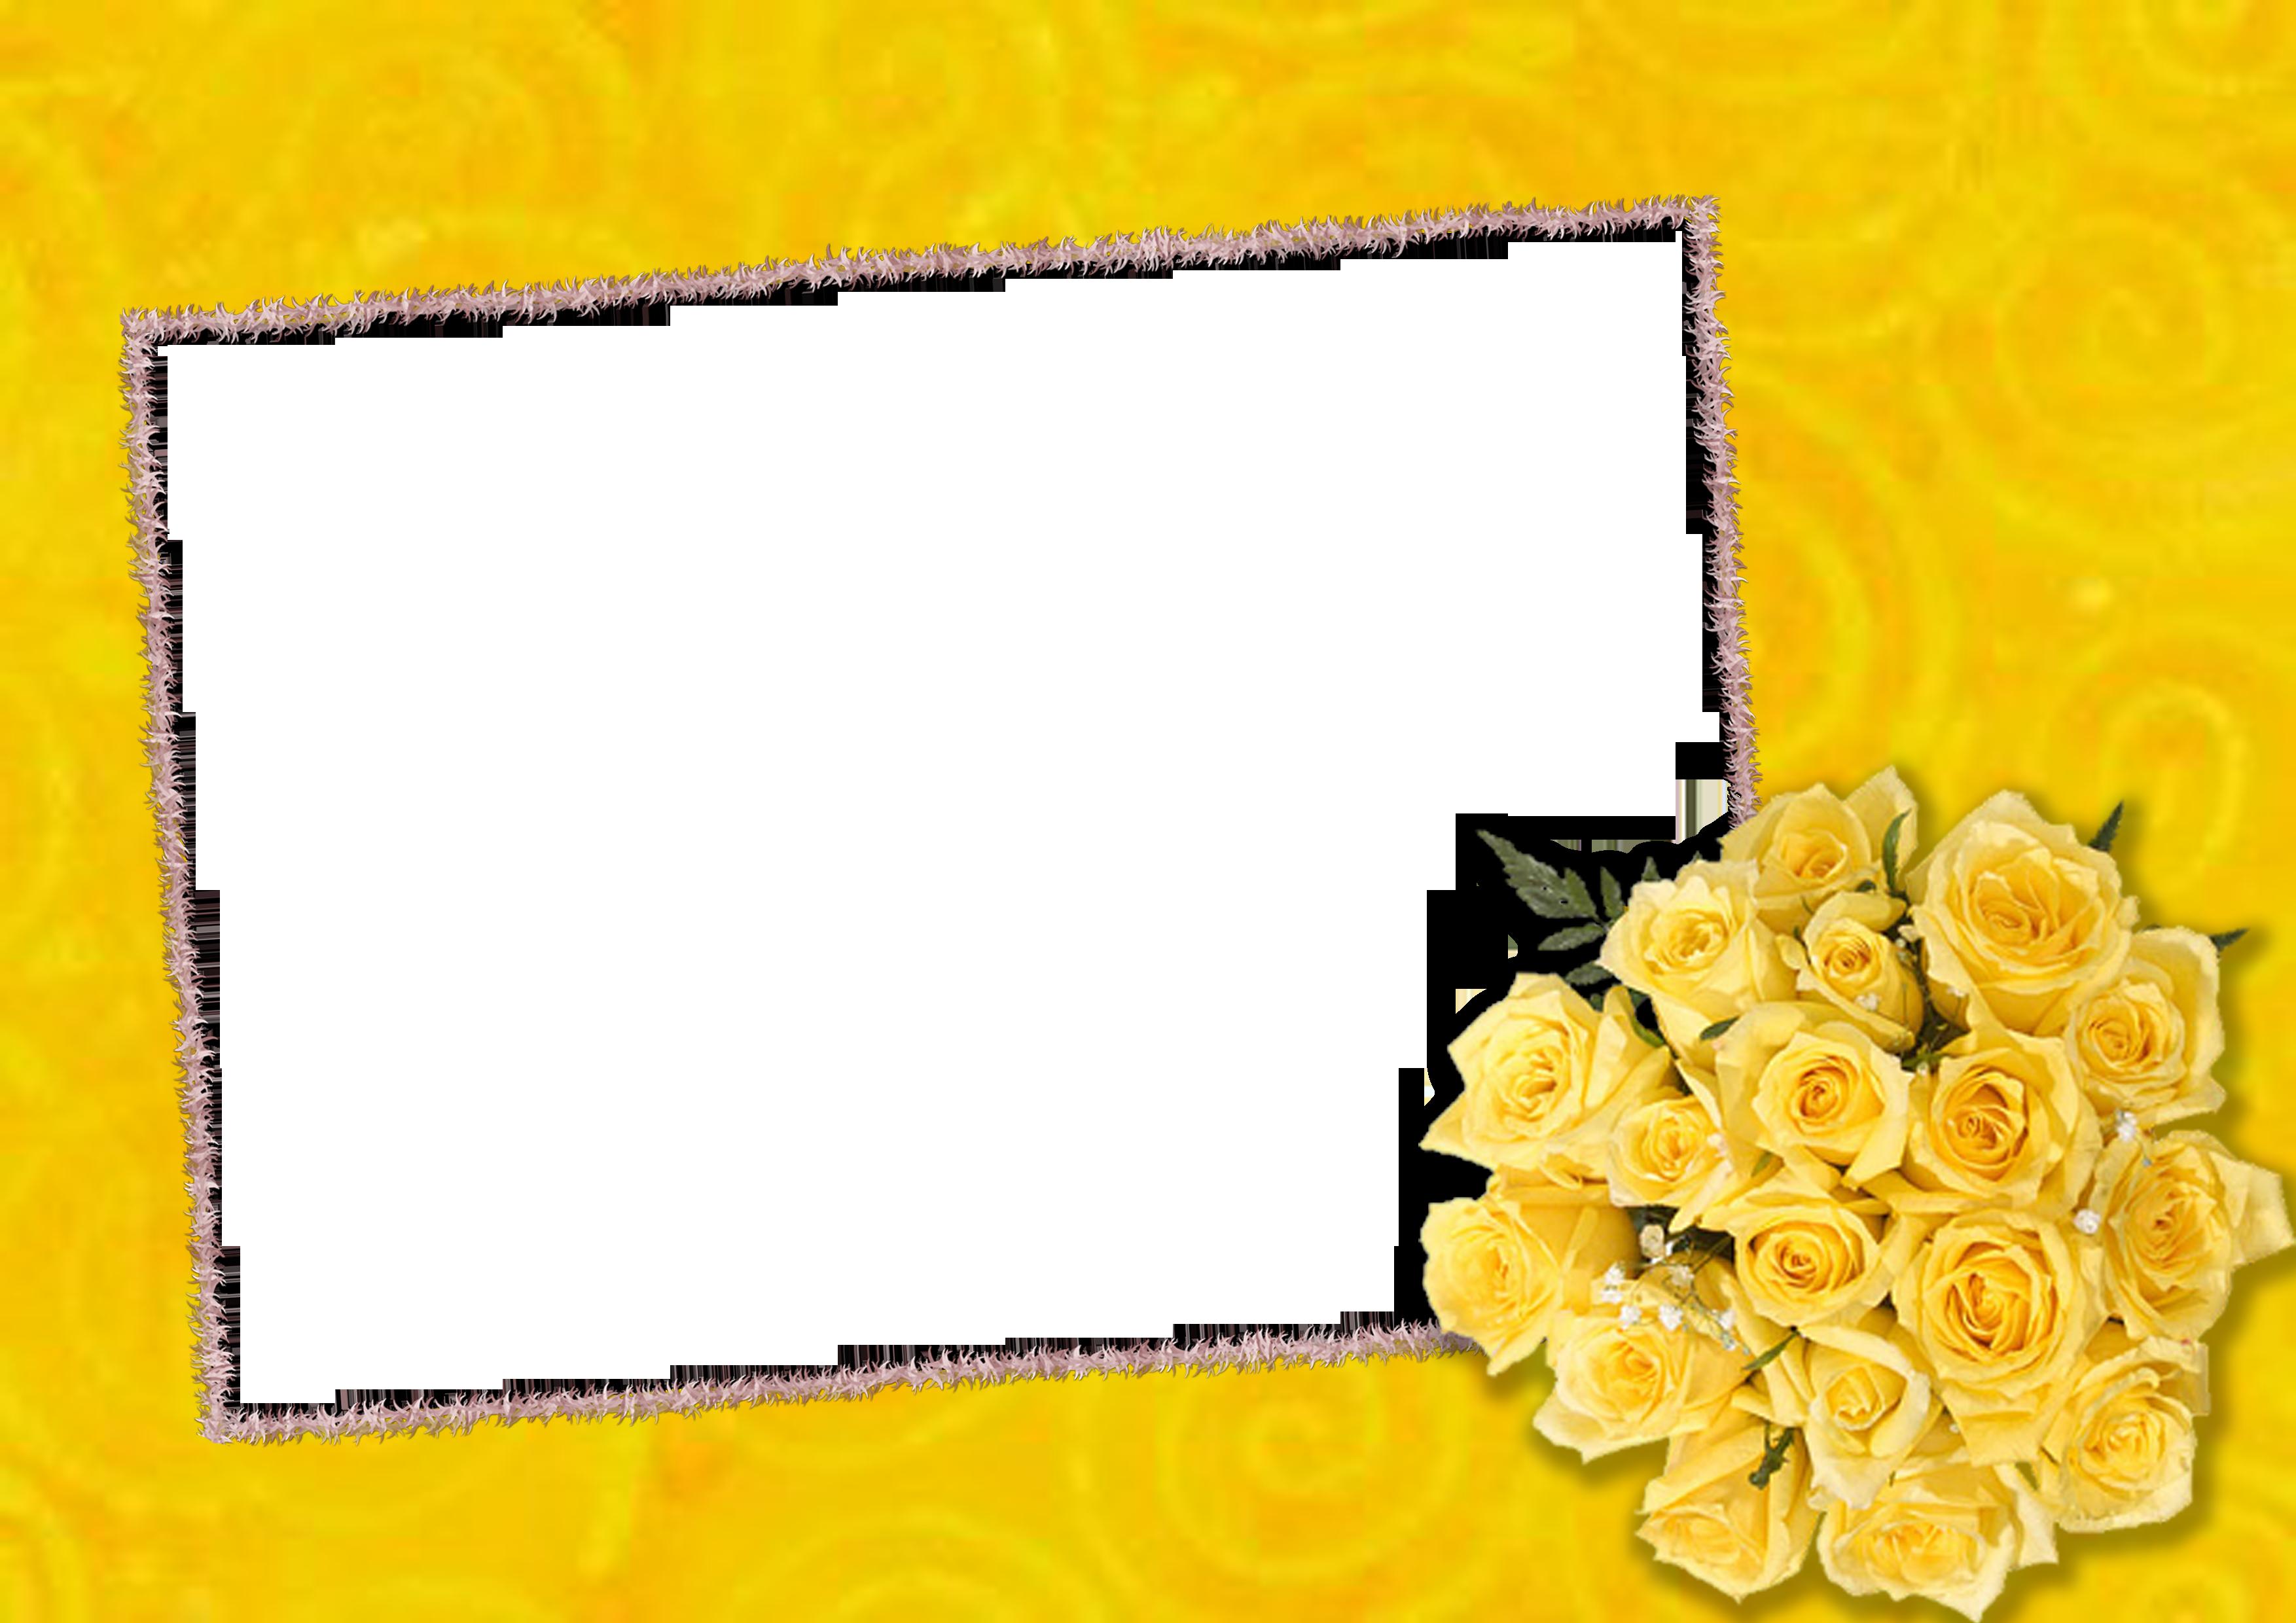 Mẫu khung ảnh hoa Photoshop